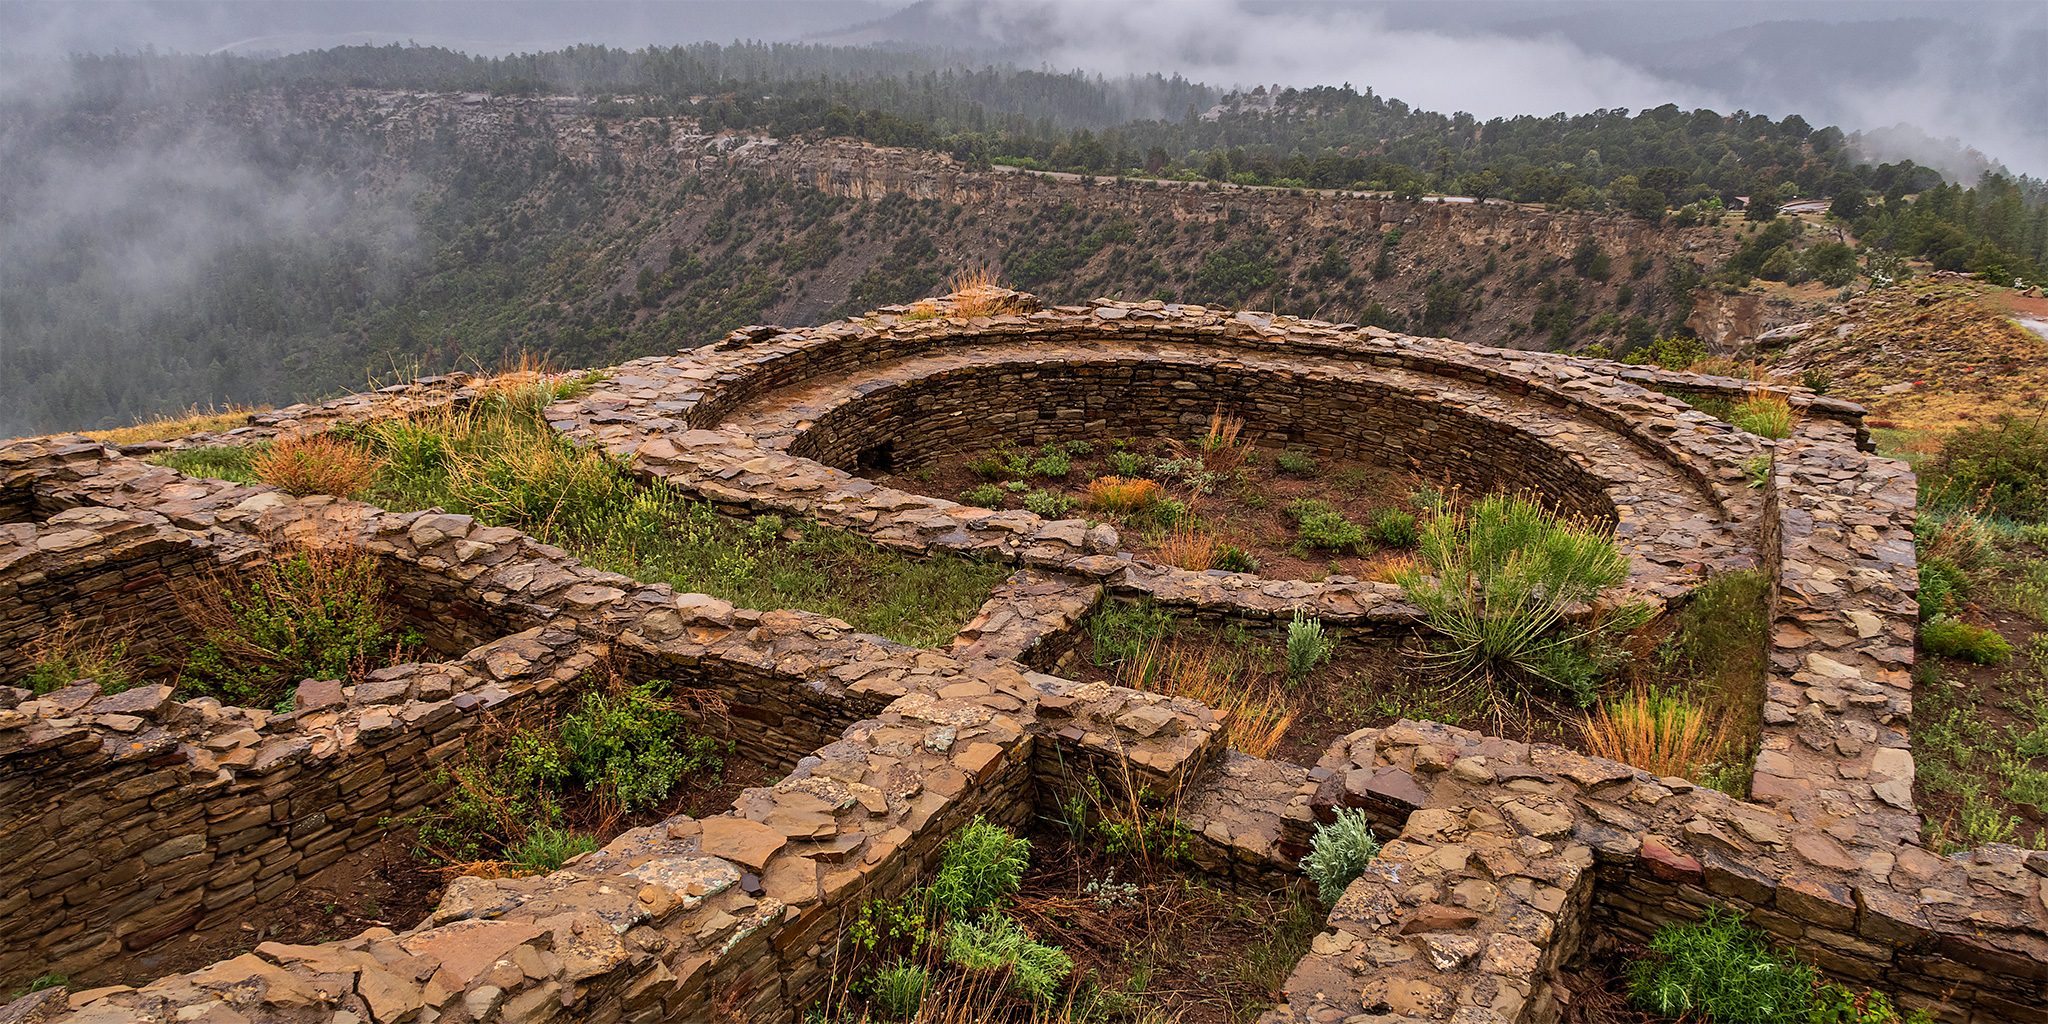 The Chaco Phenomenon of the San Juan Basin